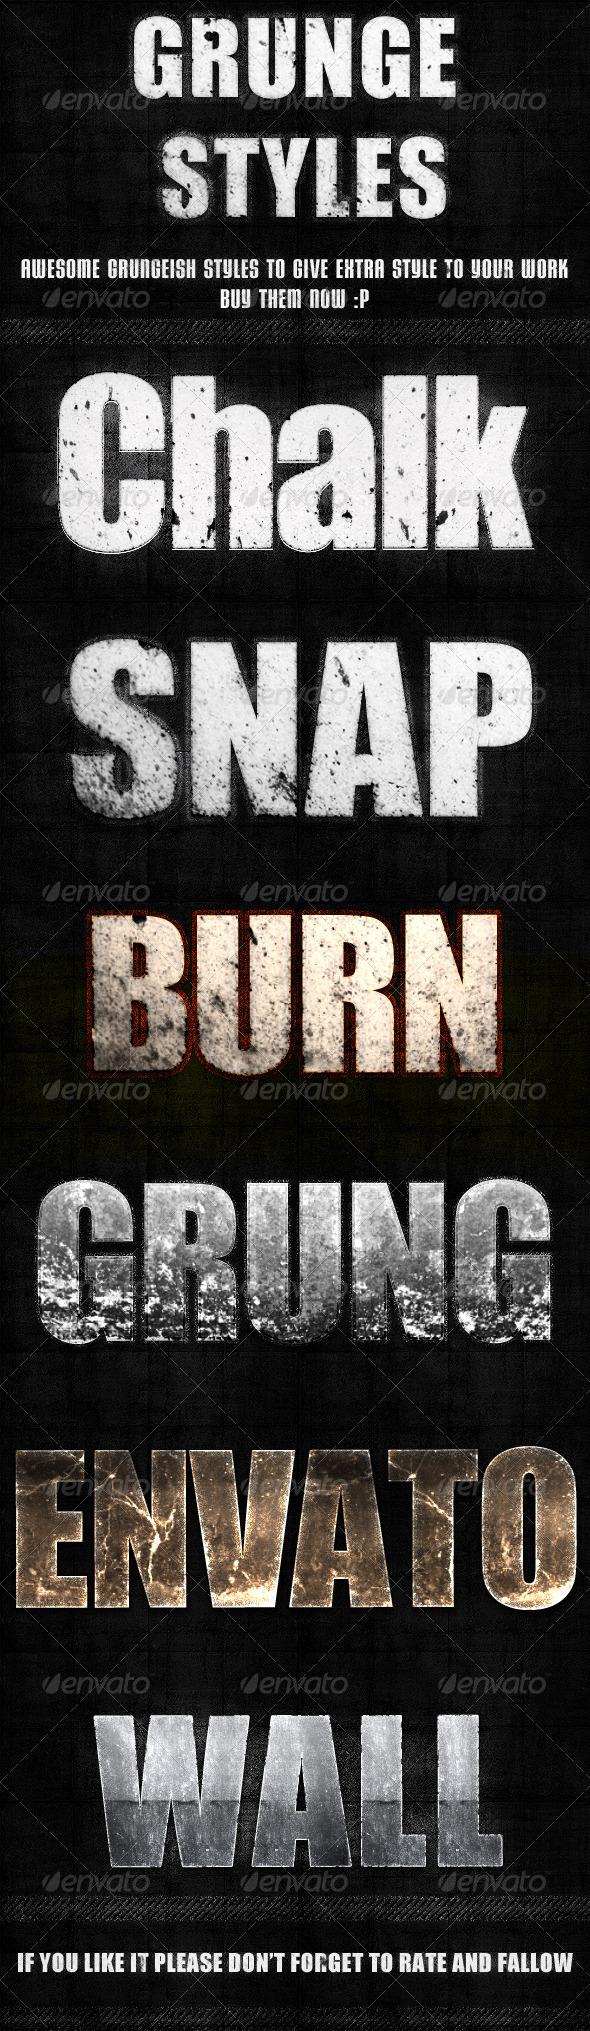 GraphicRiver Grunge Styles 3867255